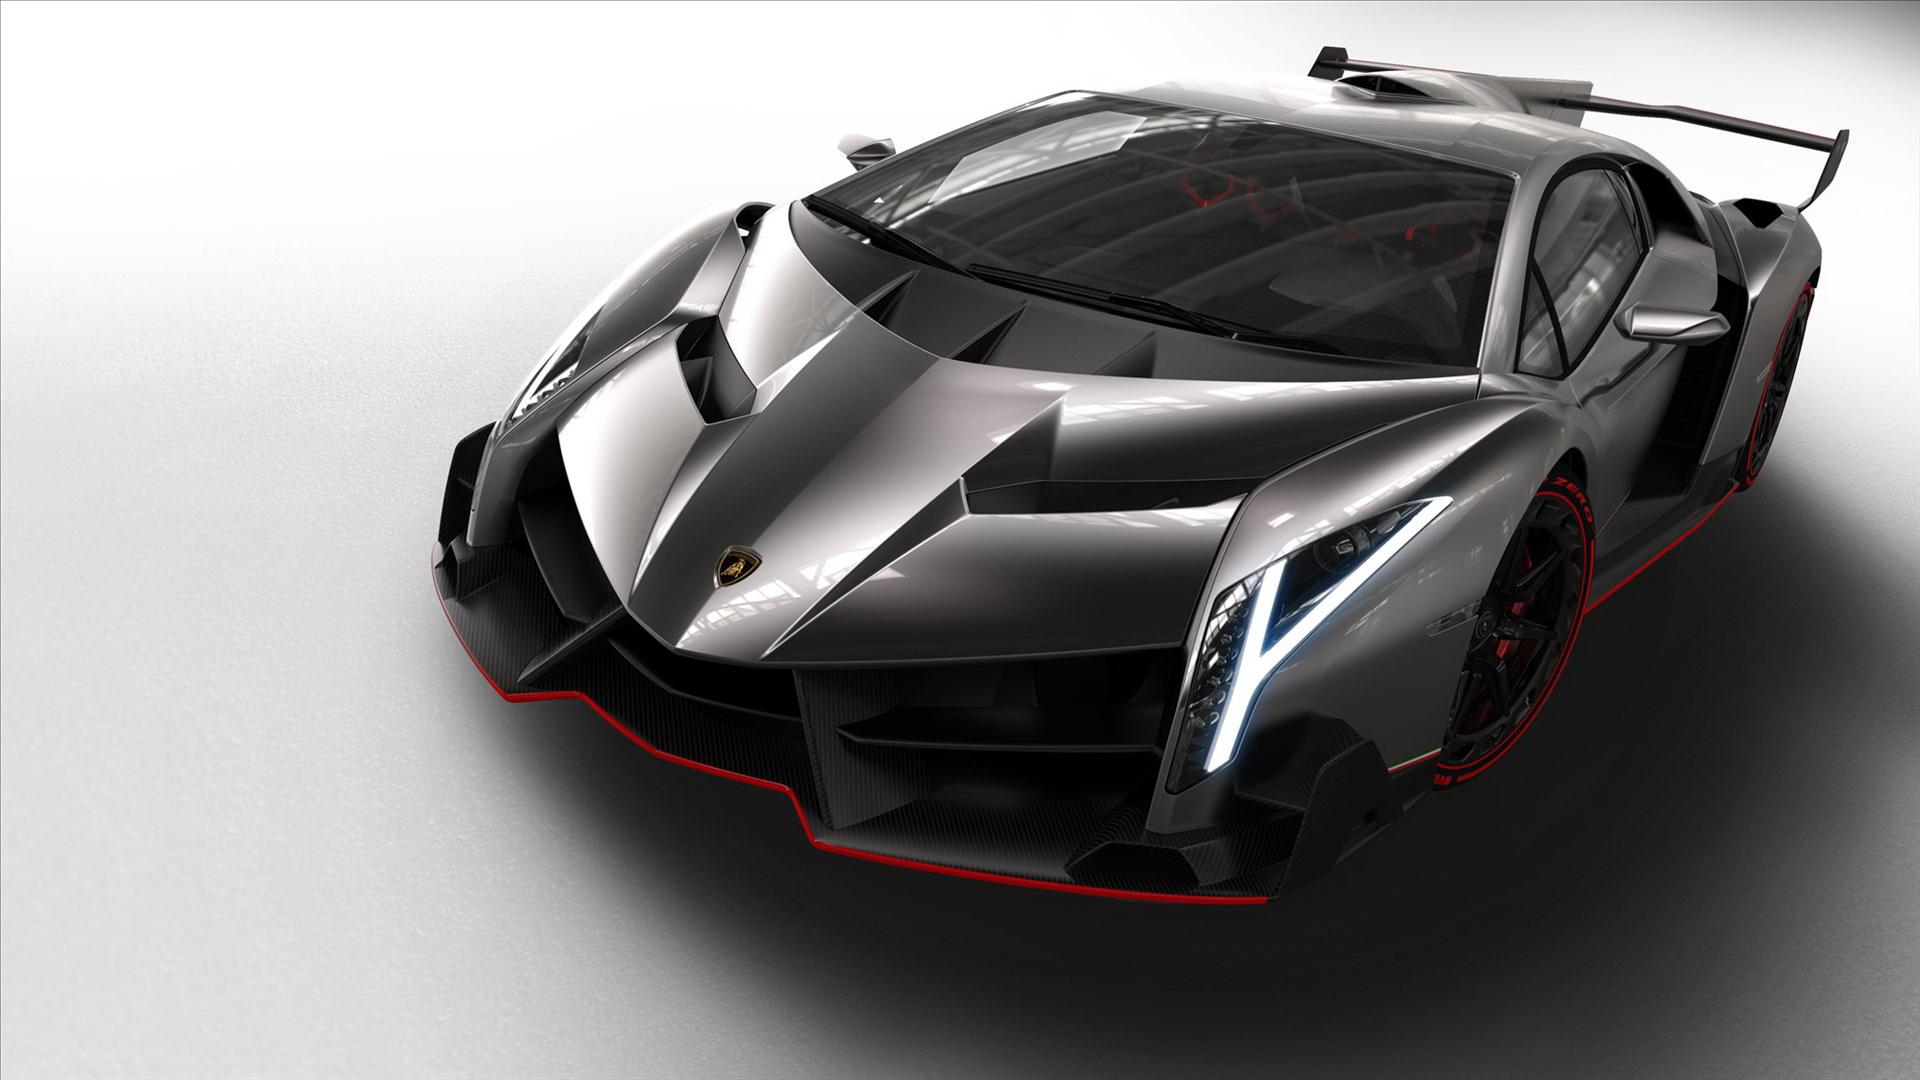 Lamborghini Race Cars Supercars 1920x1080